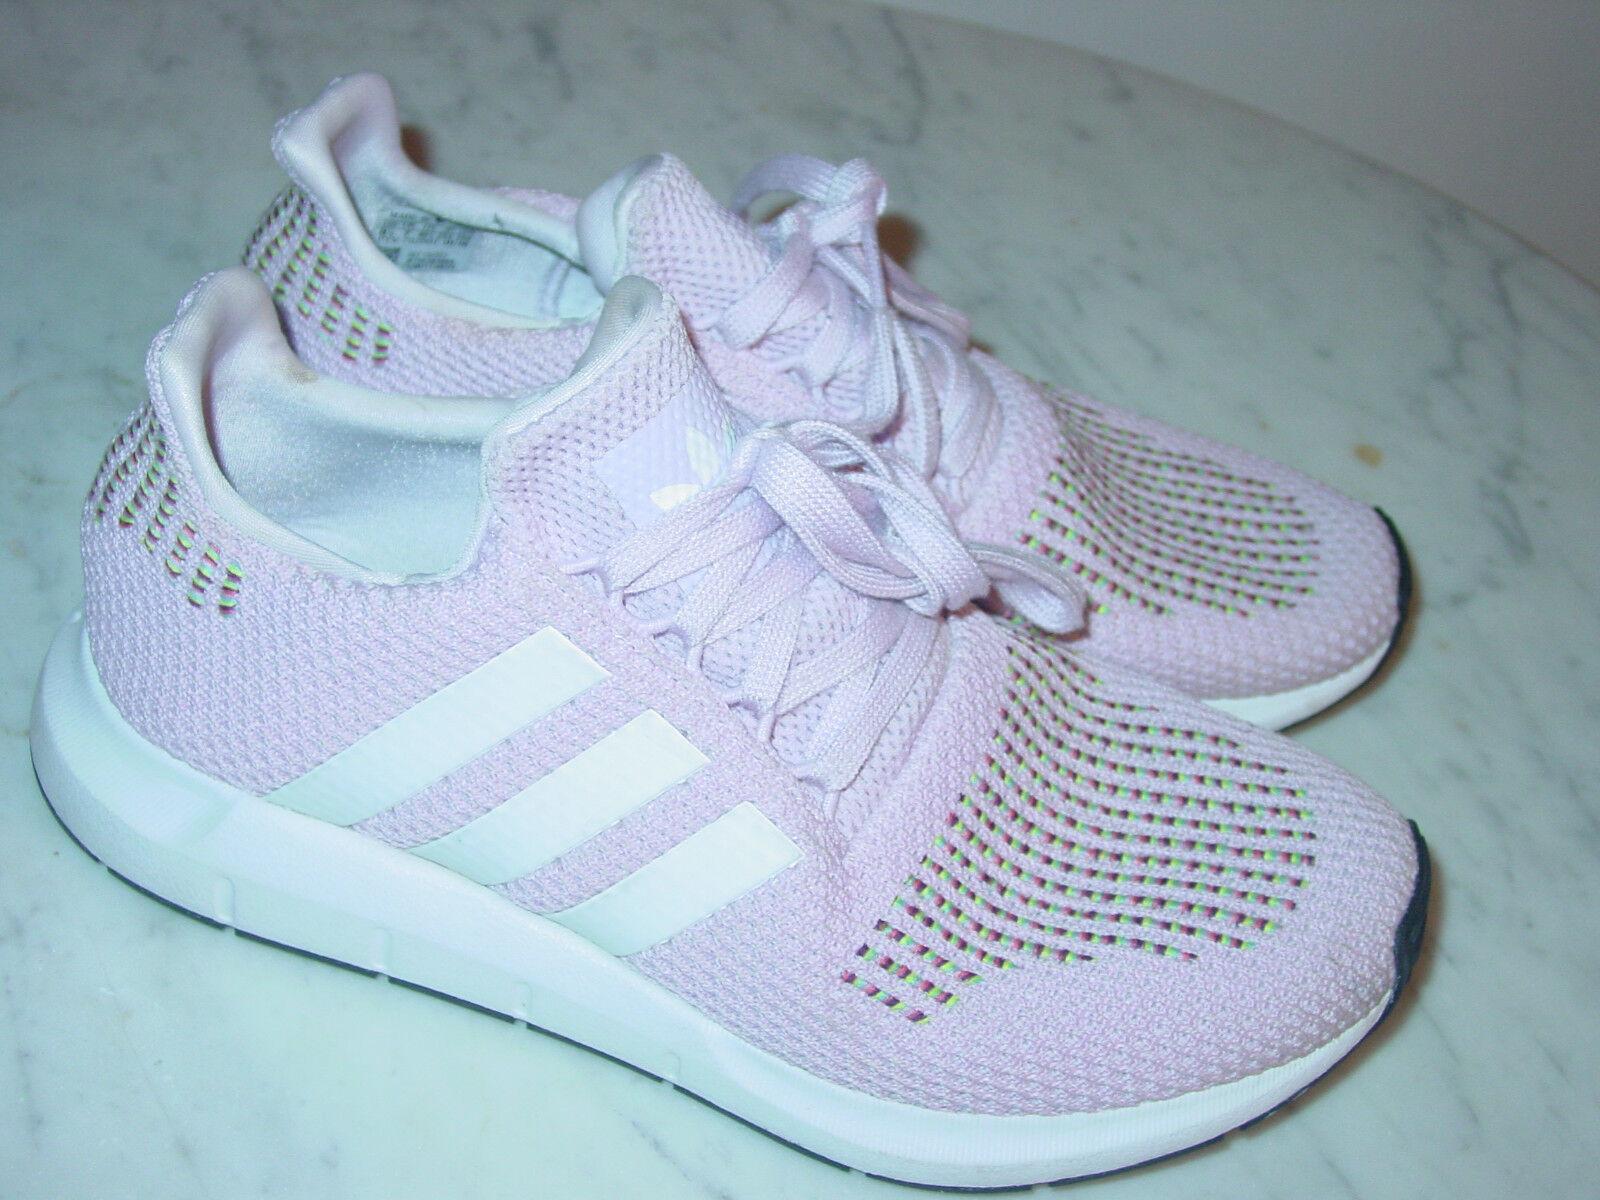 2018 Womens Adidas Swift CQ2023 Run Aero Pink White Running shoes  Size 8.5